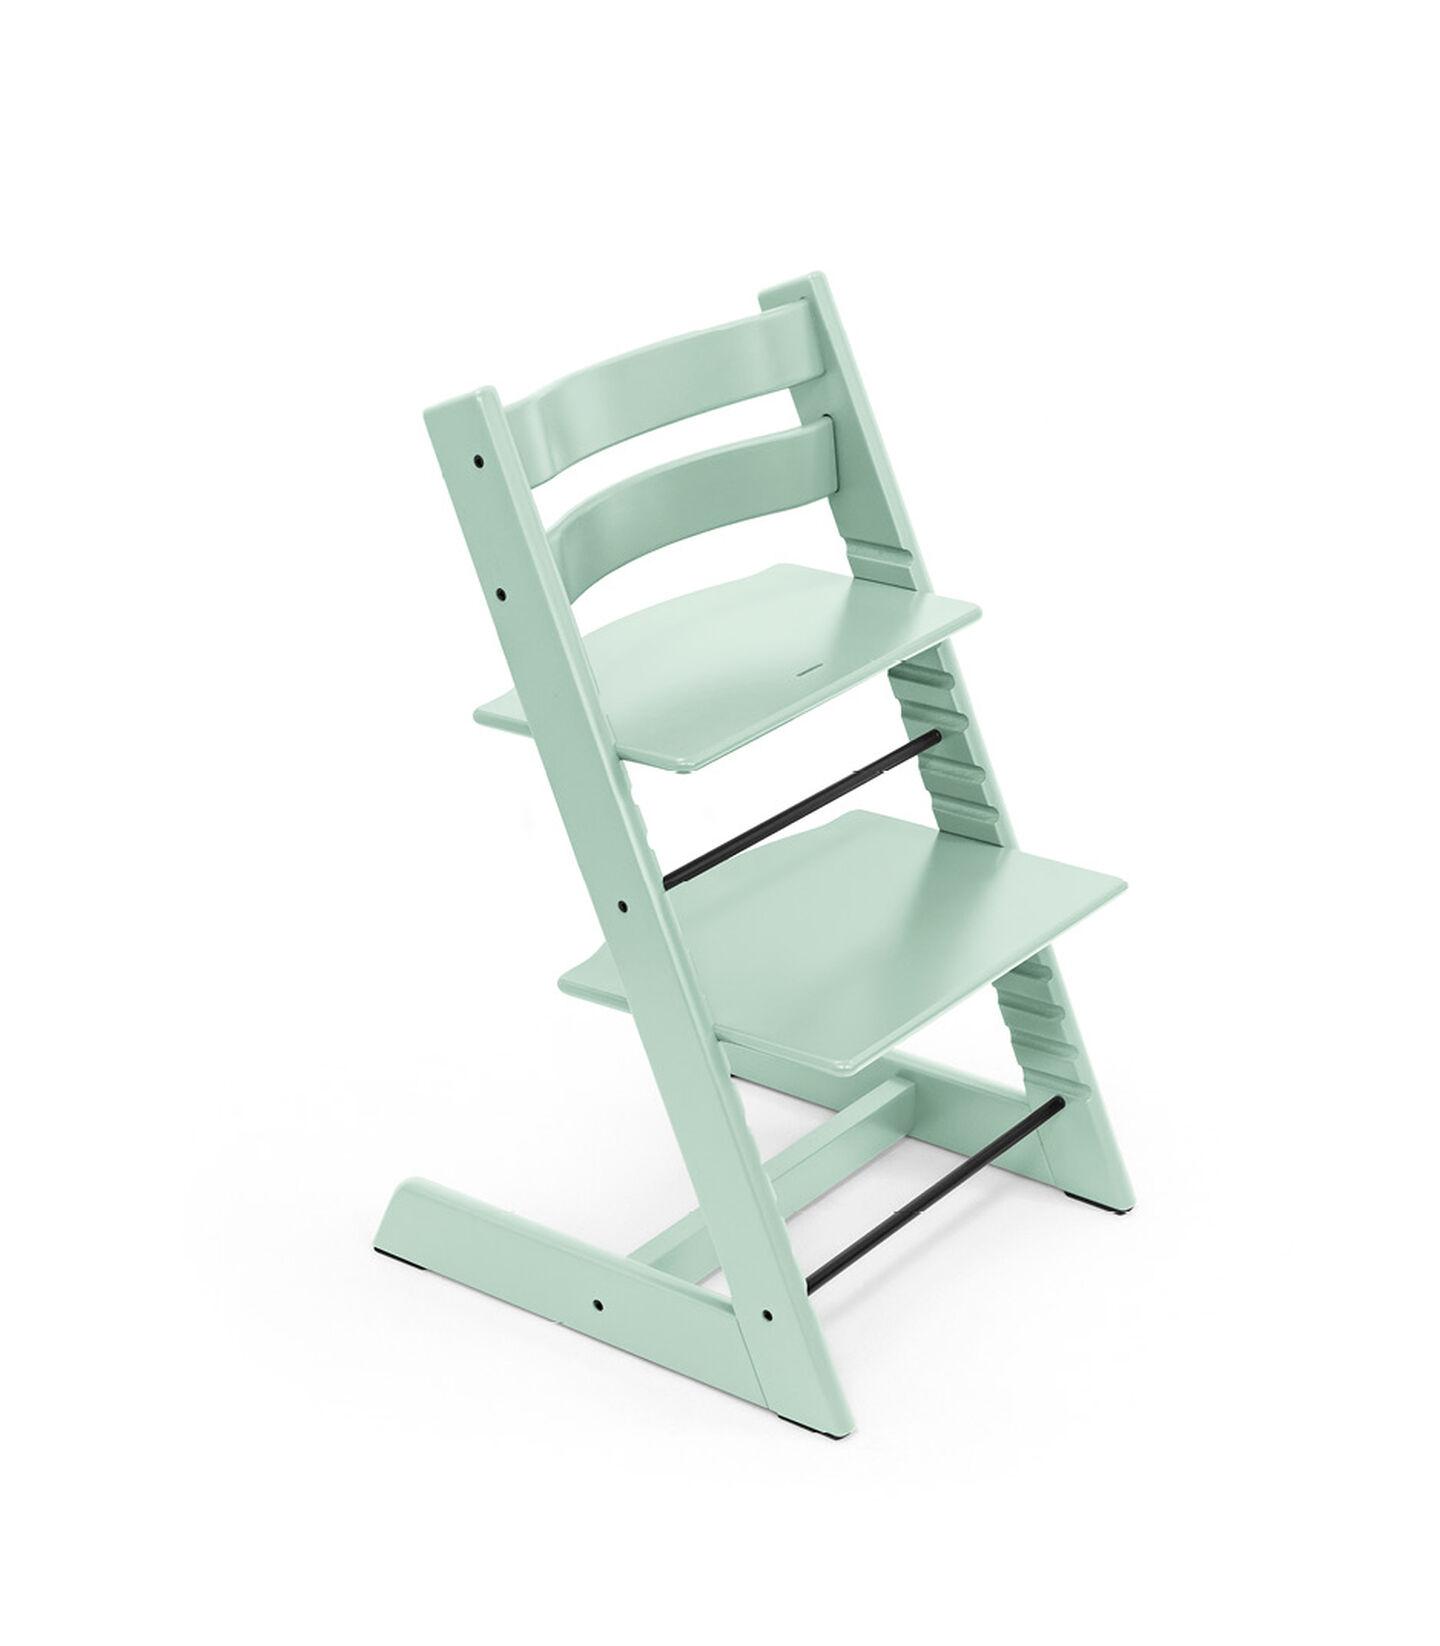 Krzesło Tripp Trapp® Delikatna mięta, Delikatna mięta, mainview view 2